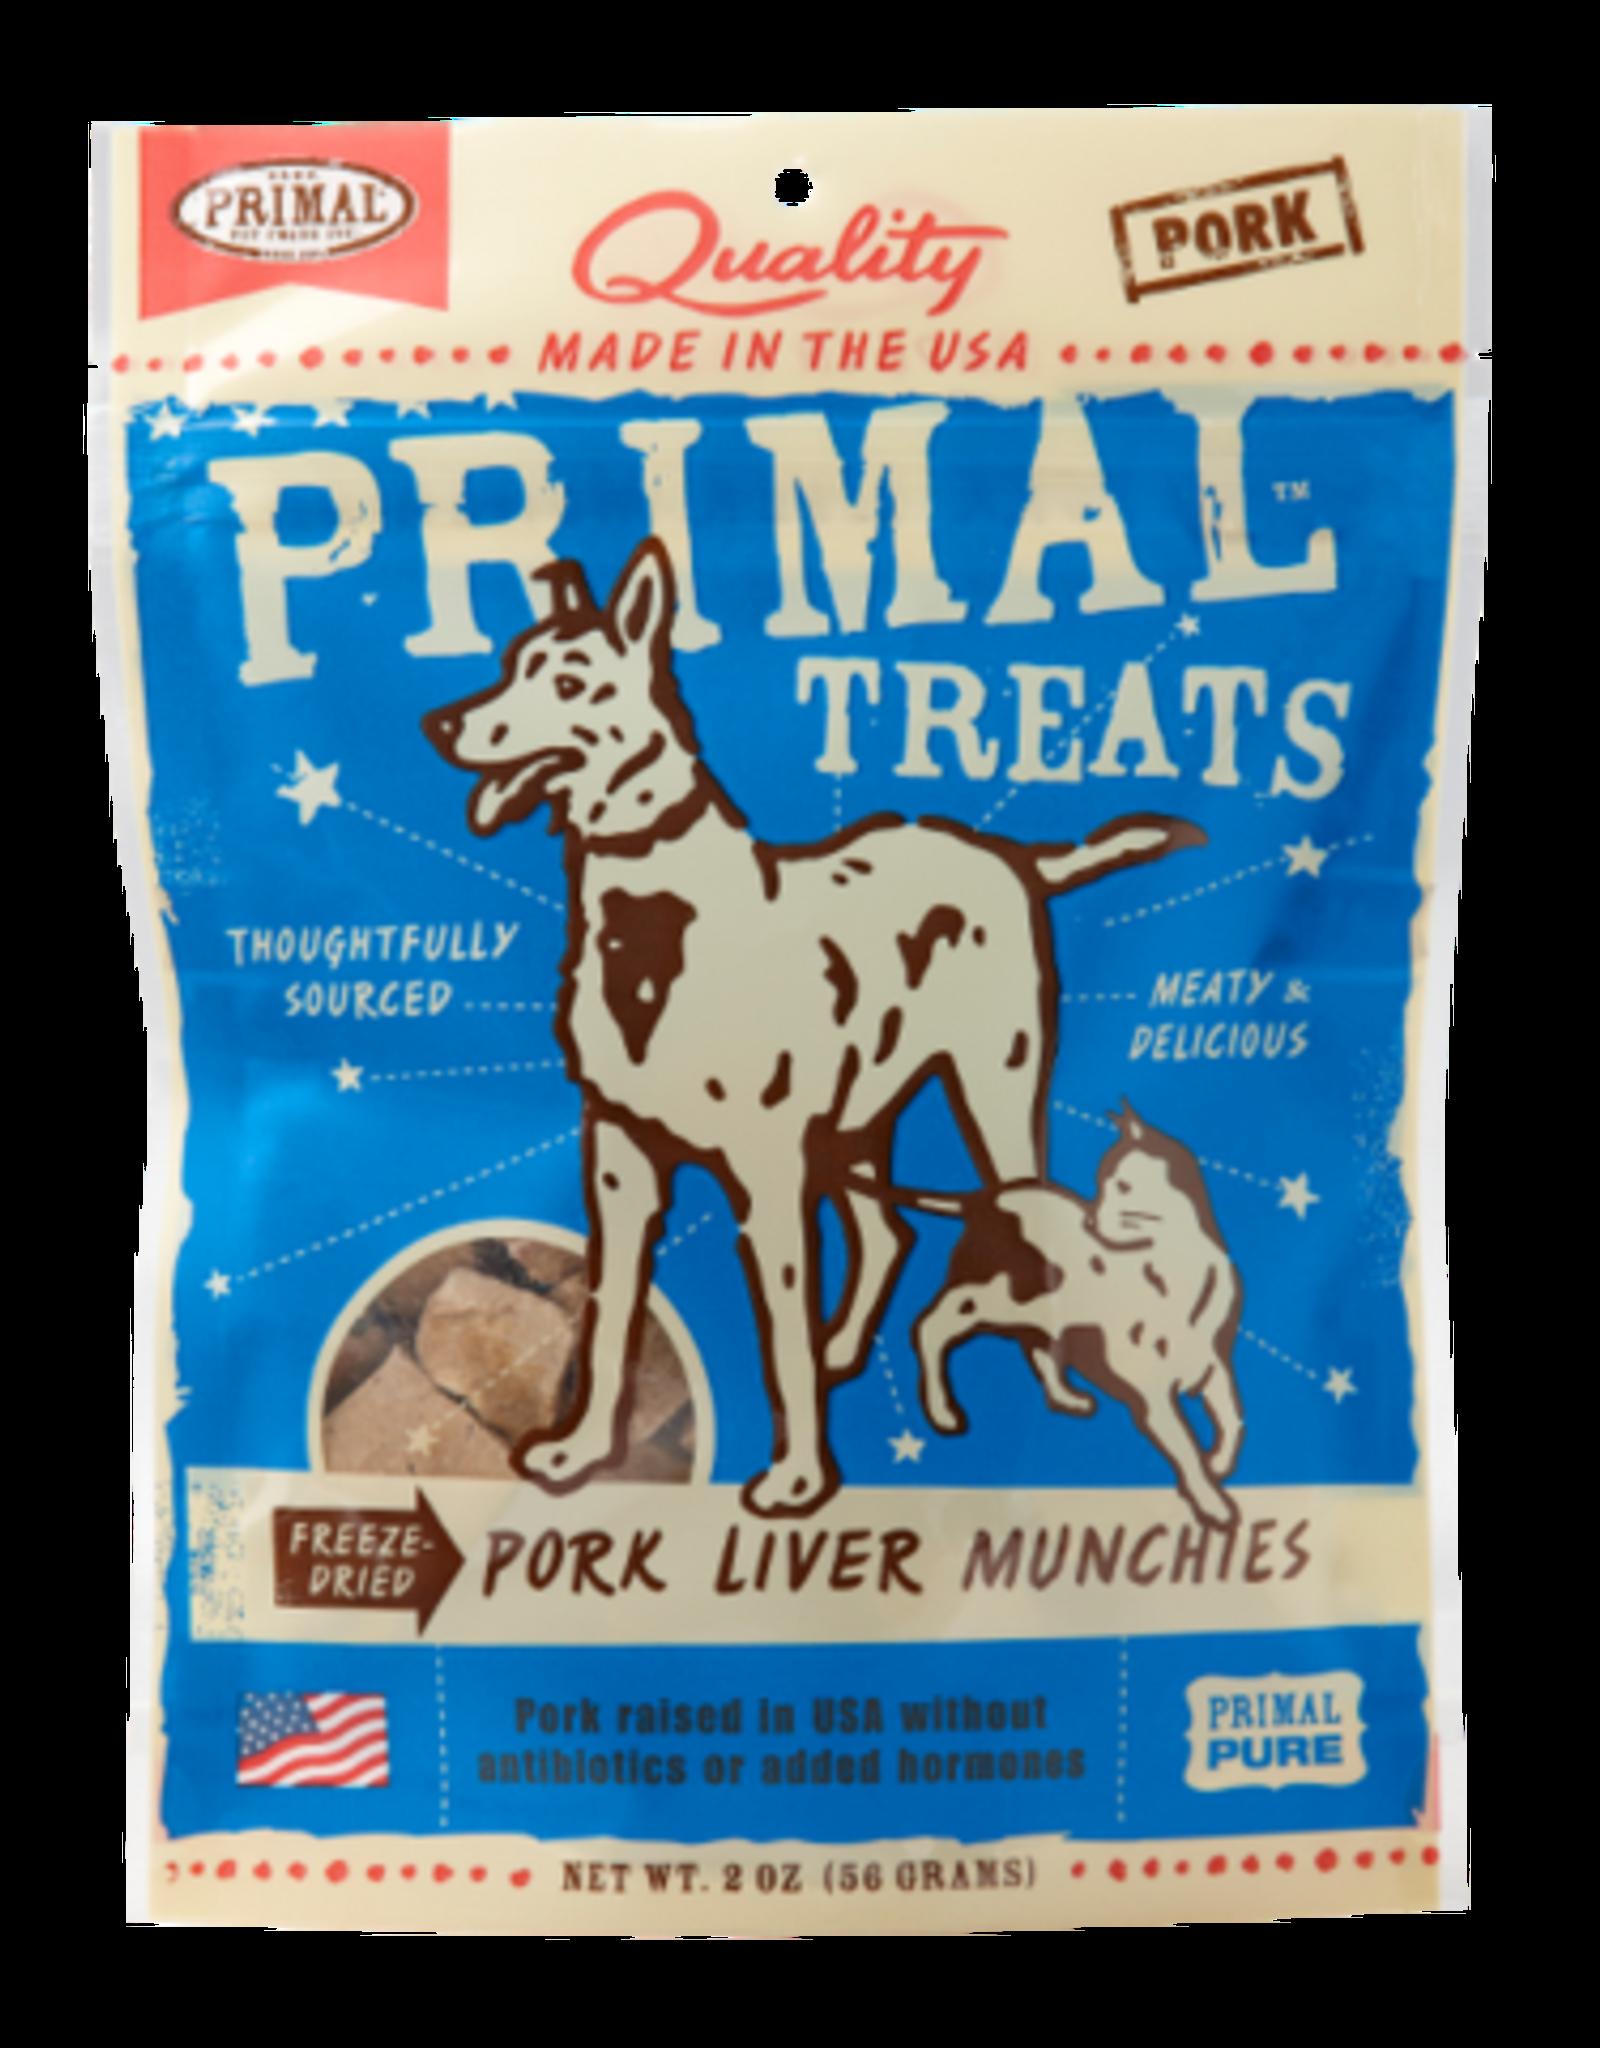 Primal Primal Pork Liver Munchies